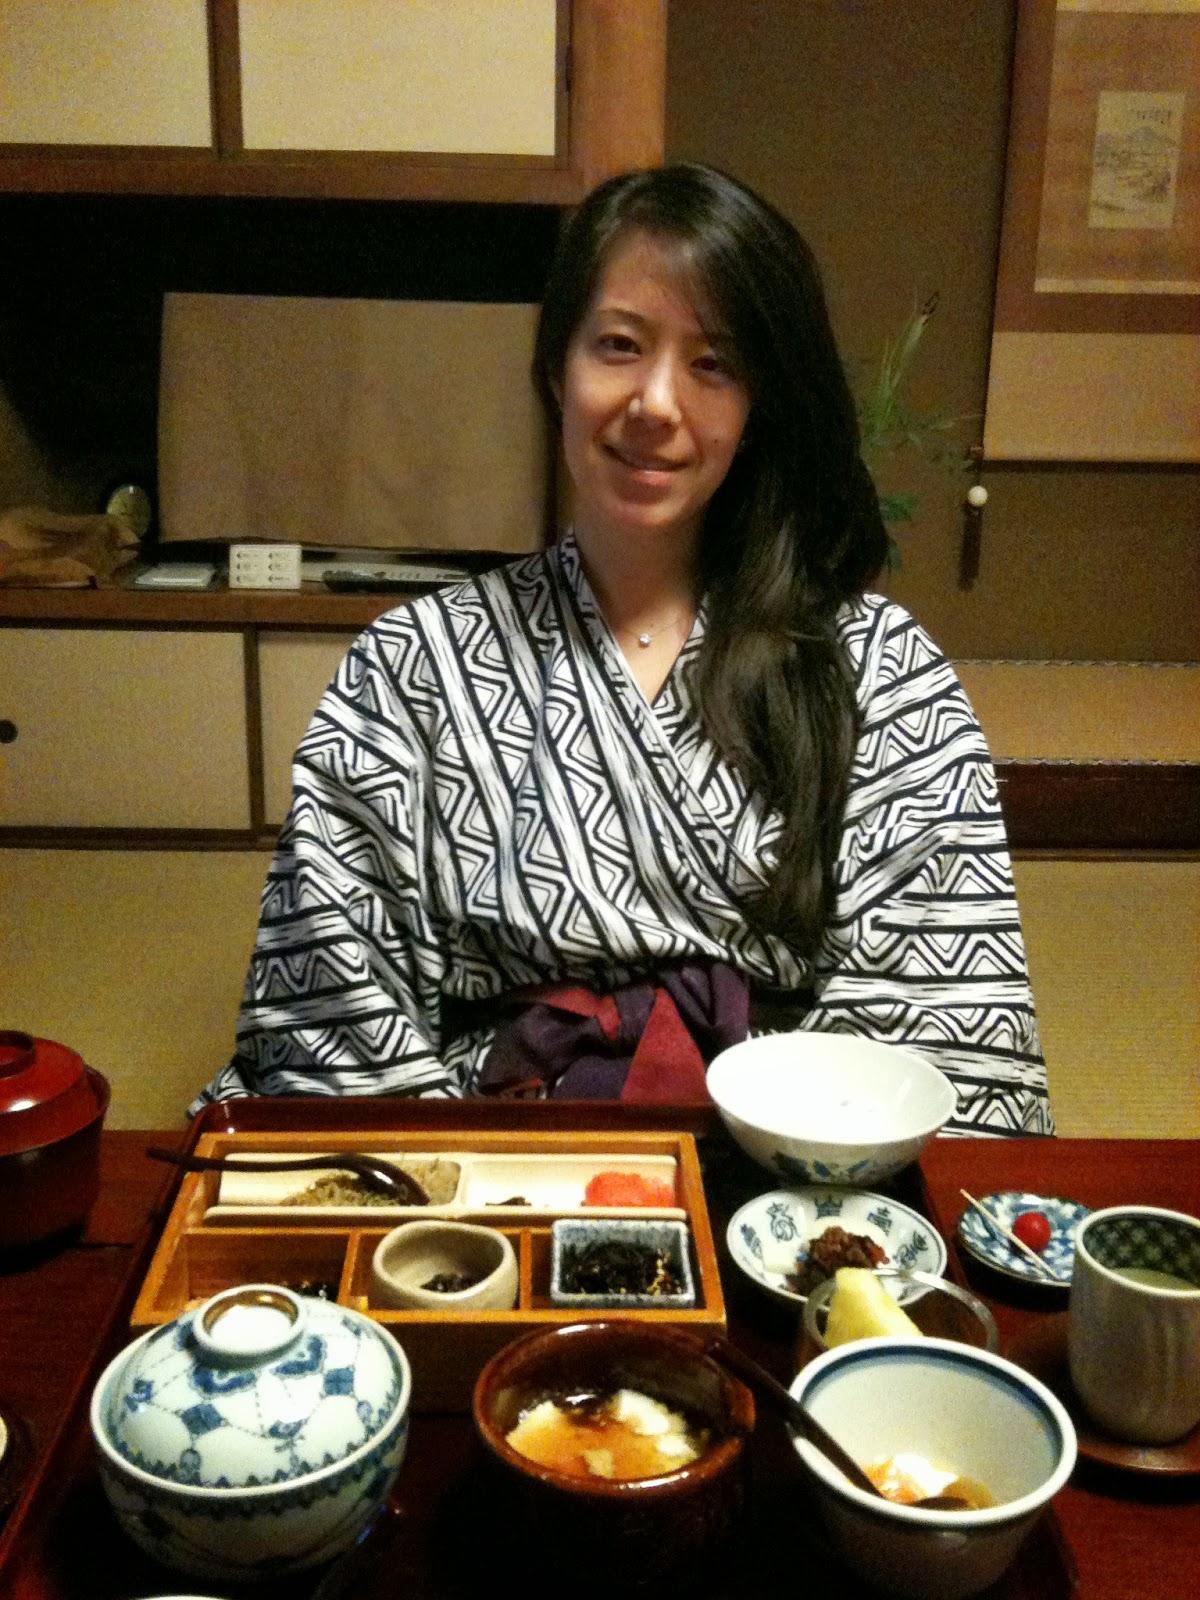 Kyoto - Breakfast is served!